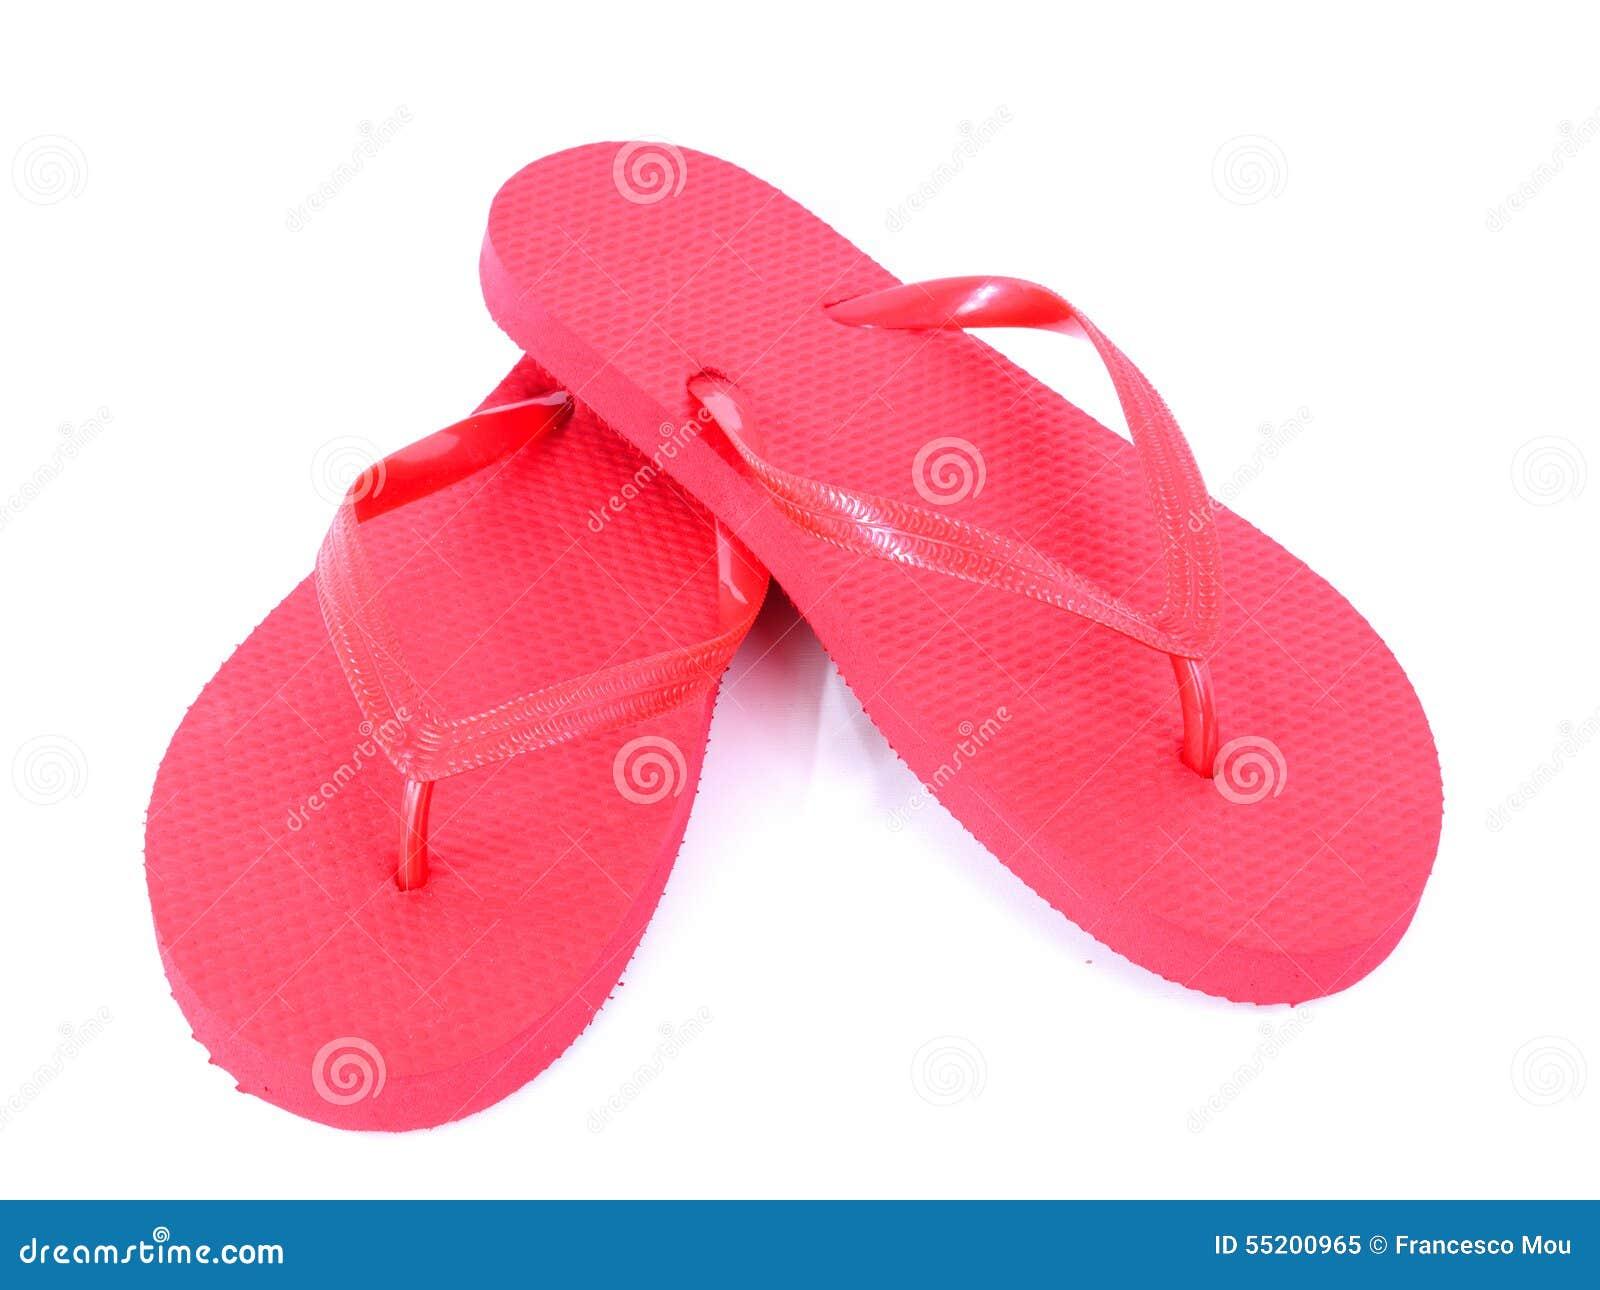 71ffda7571dd Flip flops red photographed in studio on white background